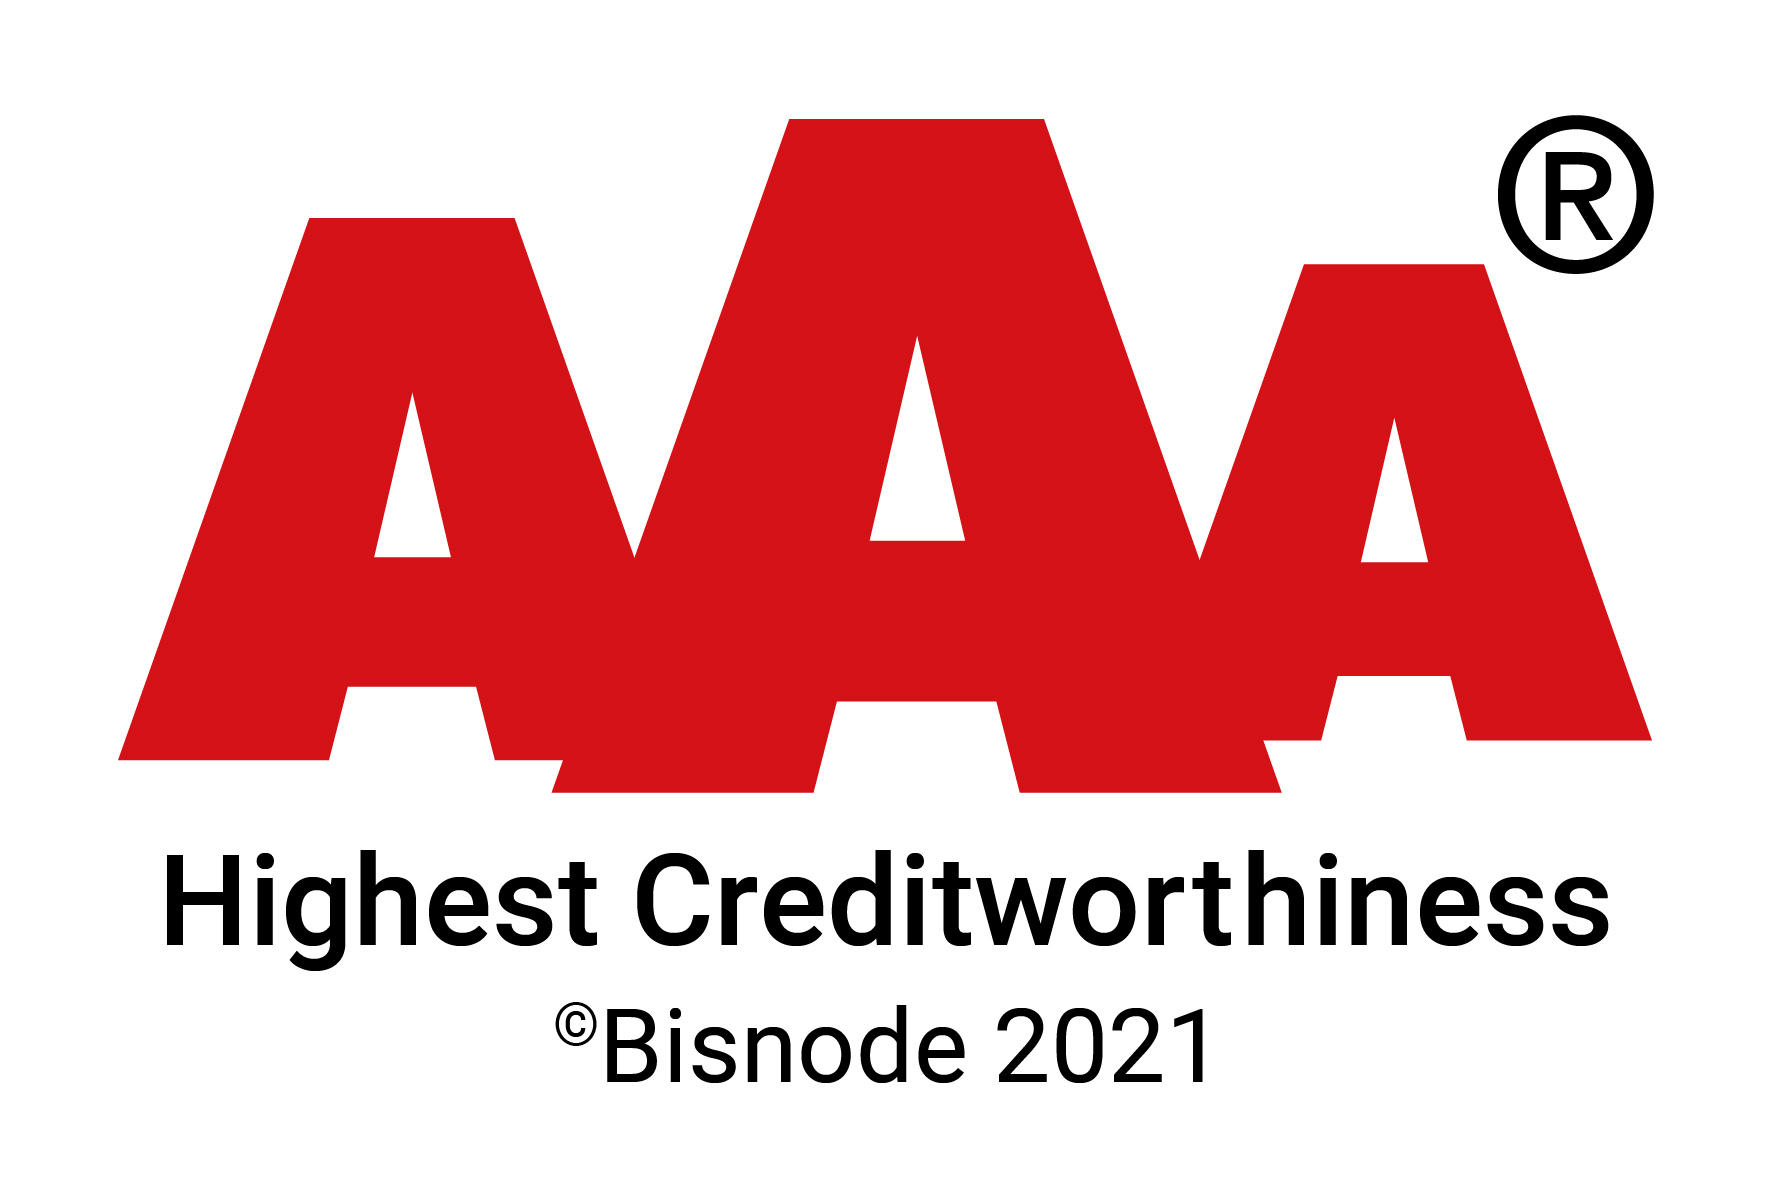 AAA highest creditworthiness